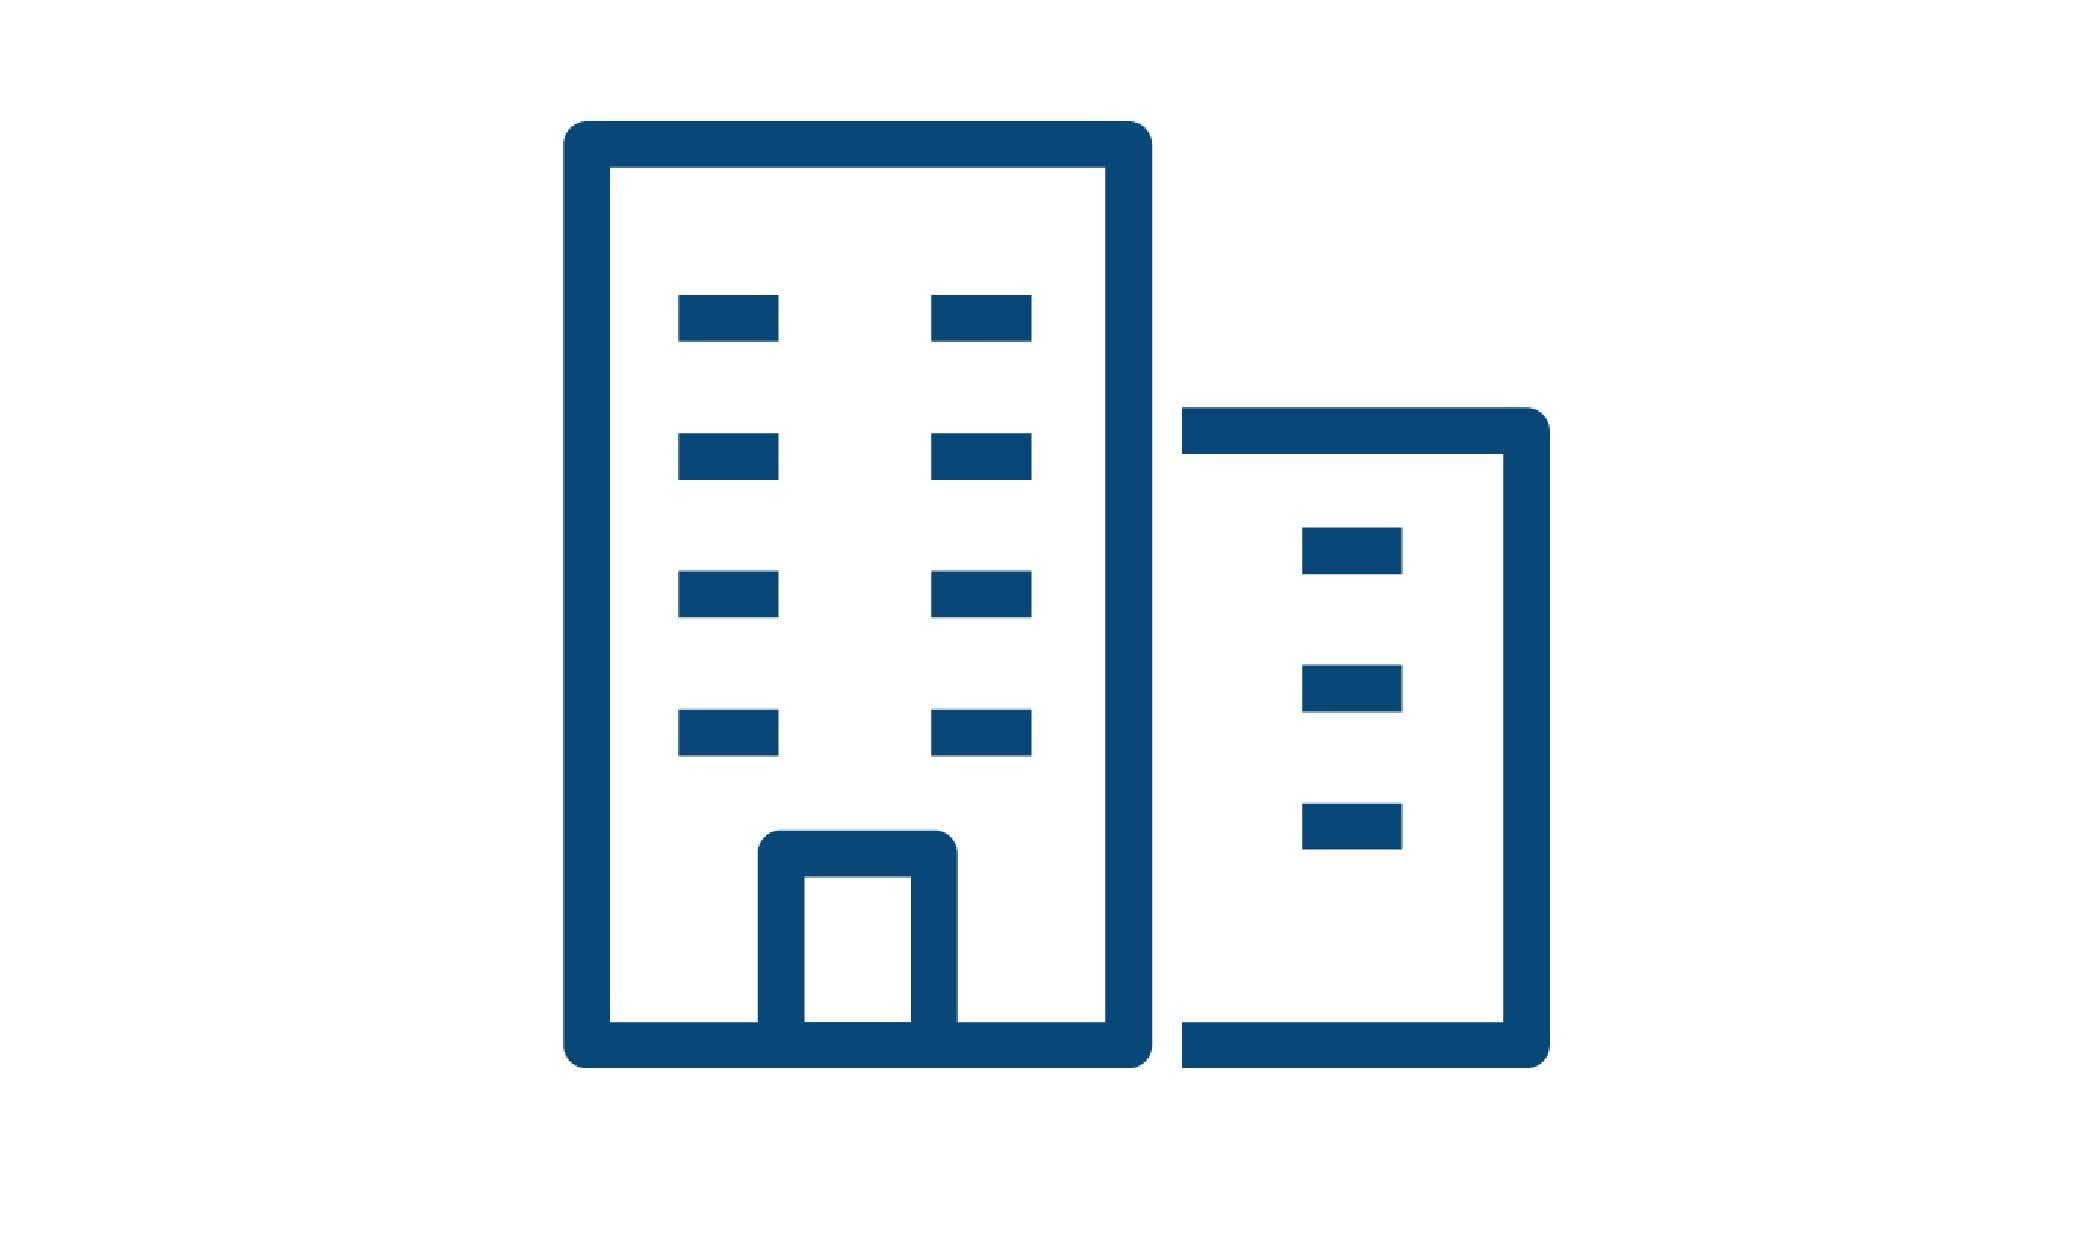 commercial-real-estate-efficiency-program-implementer